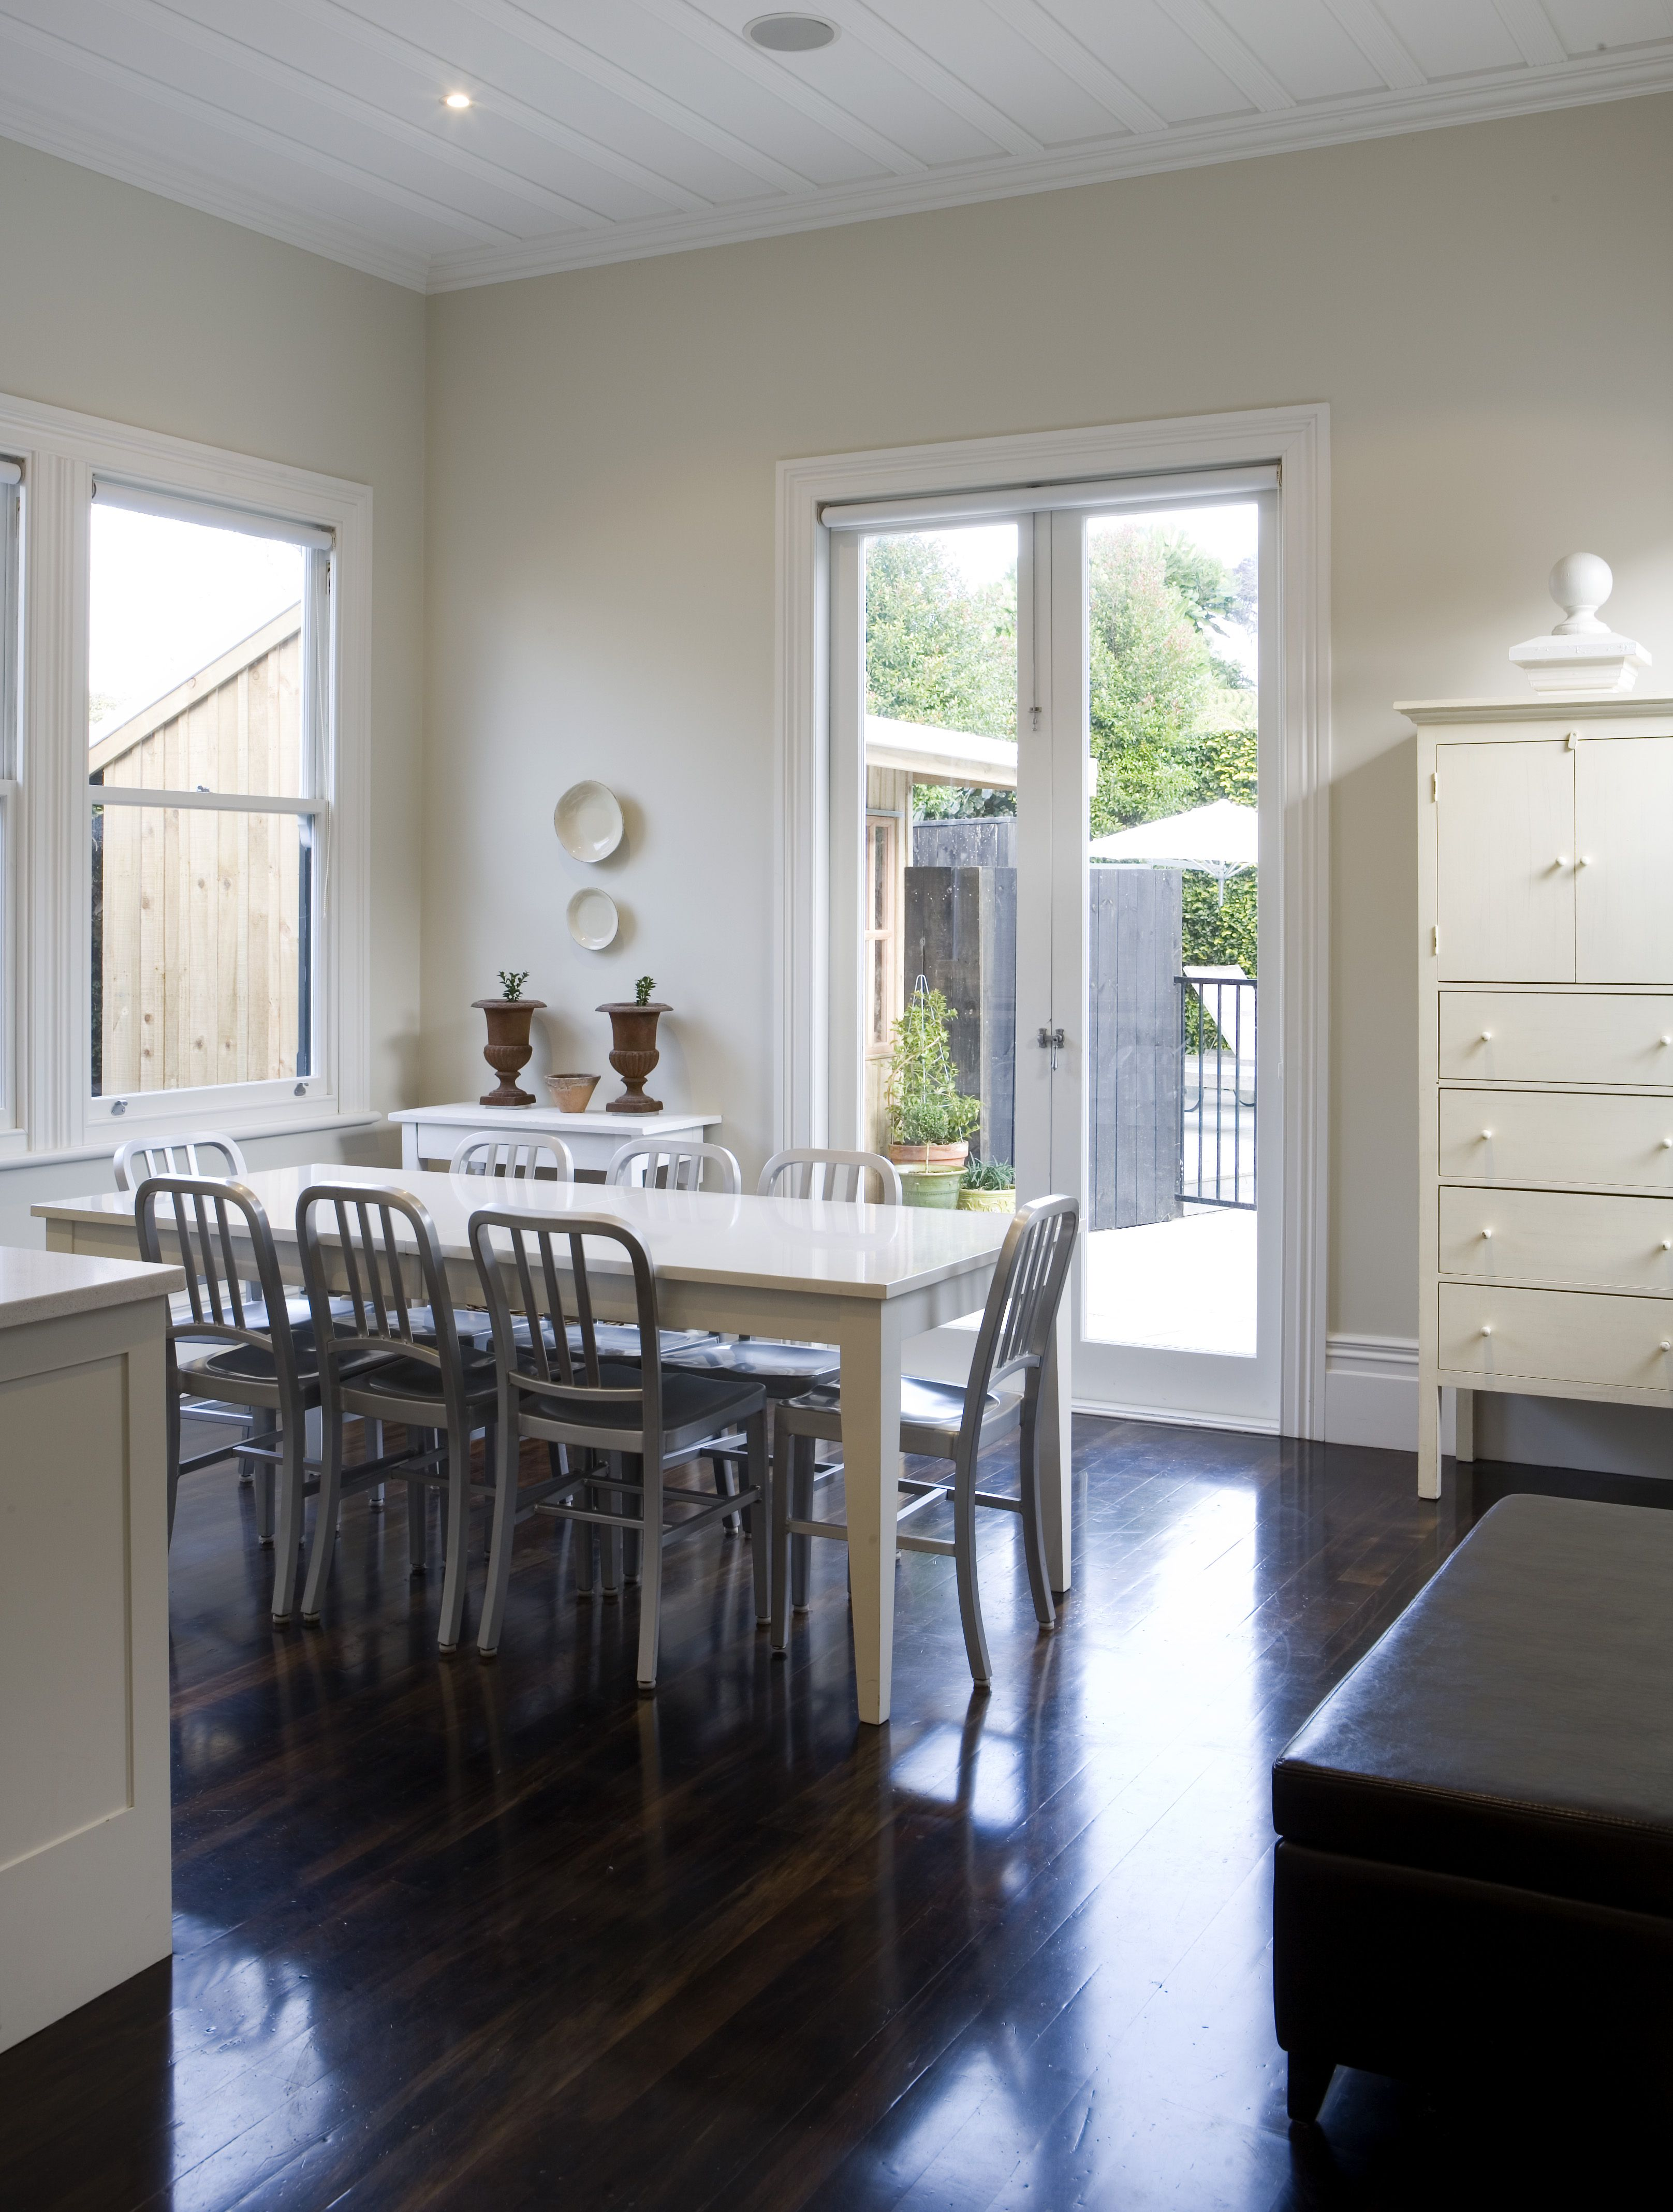 Resene ecru white walls with resene black white trims